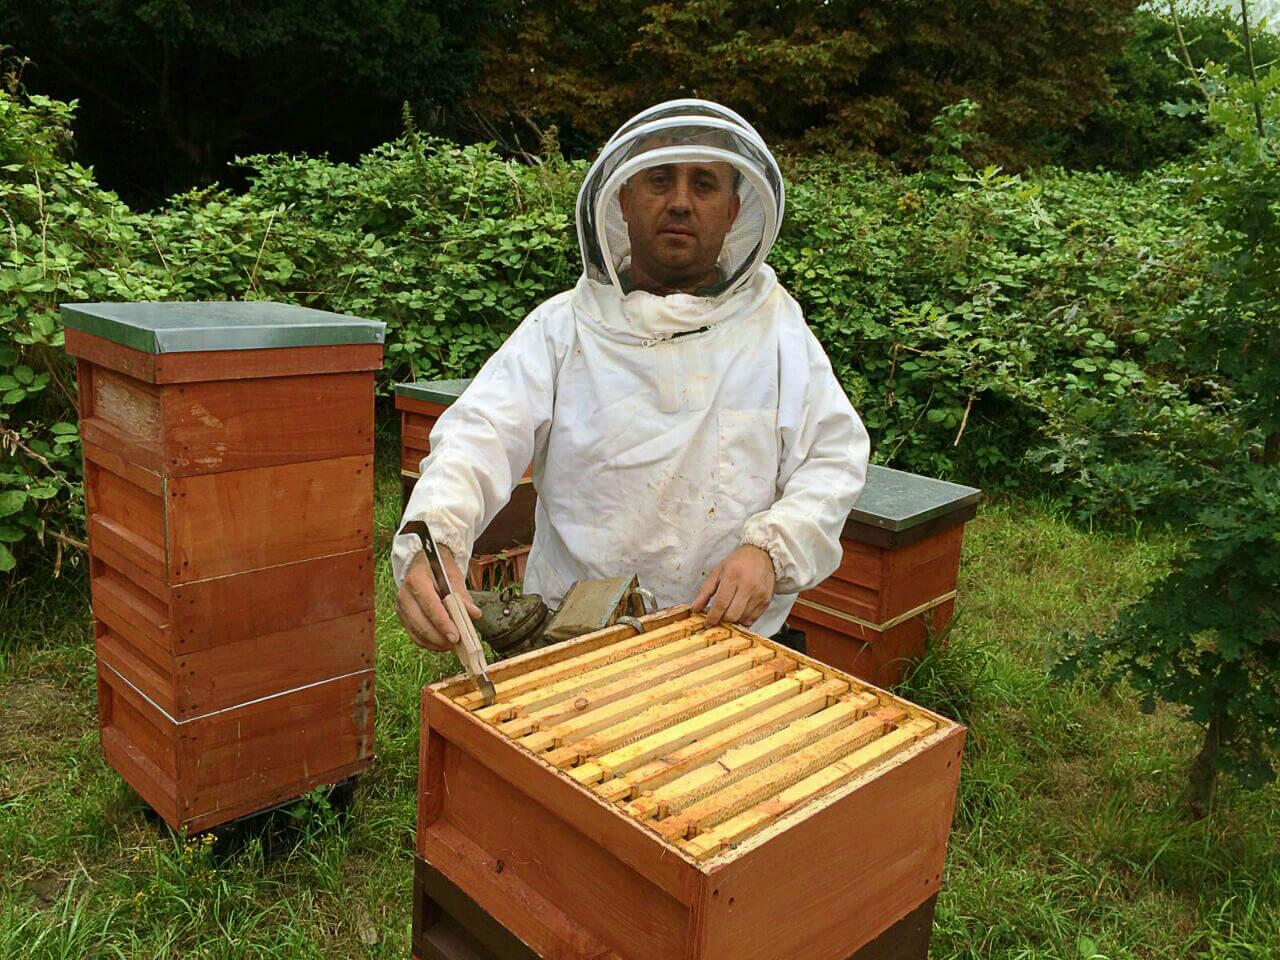 Eduard working with beehive